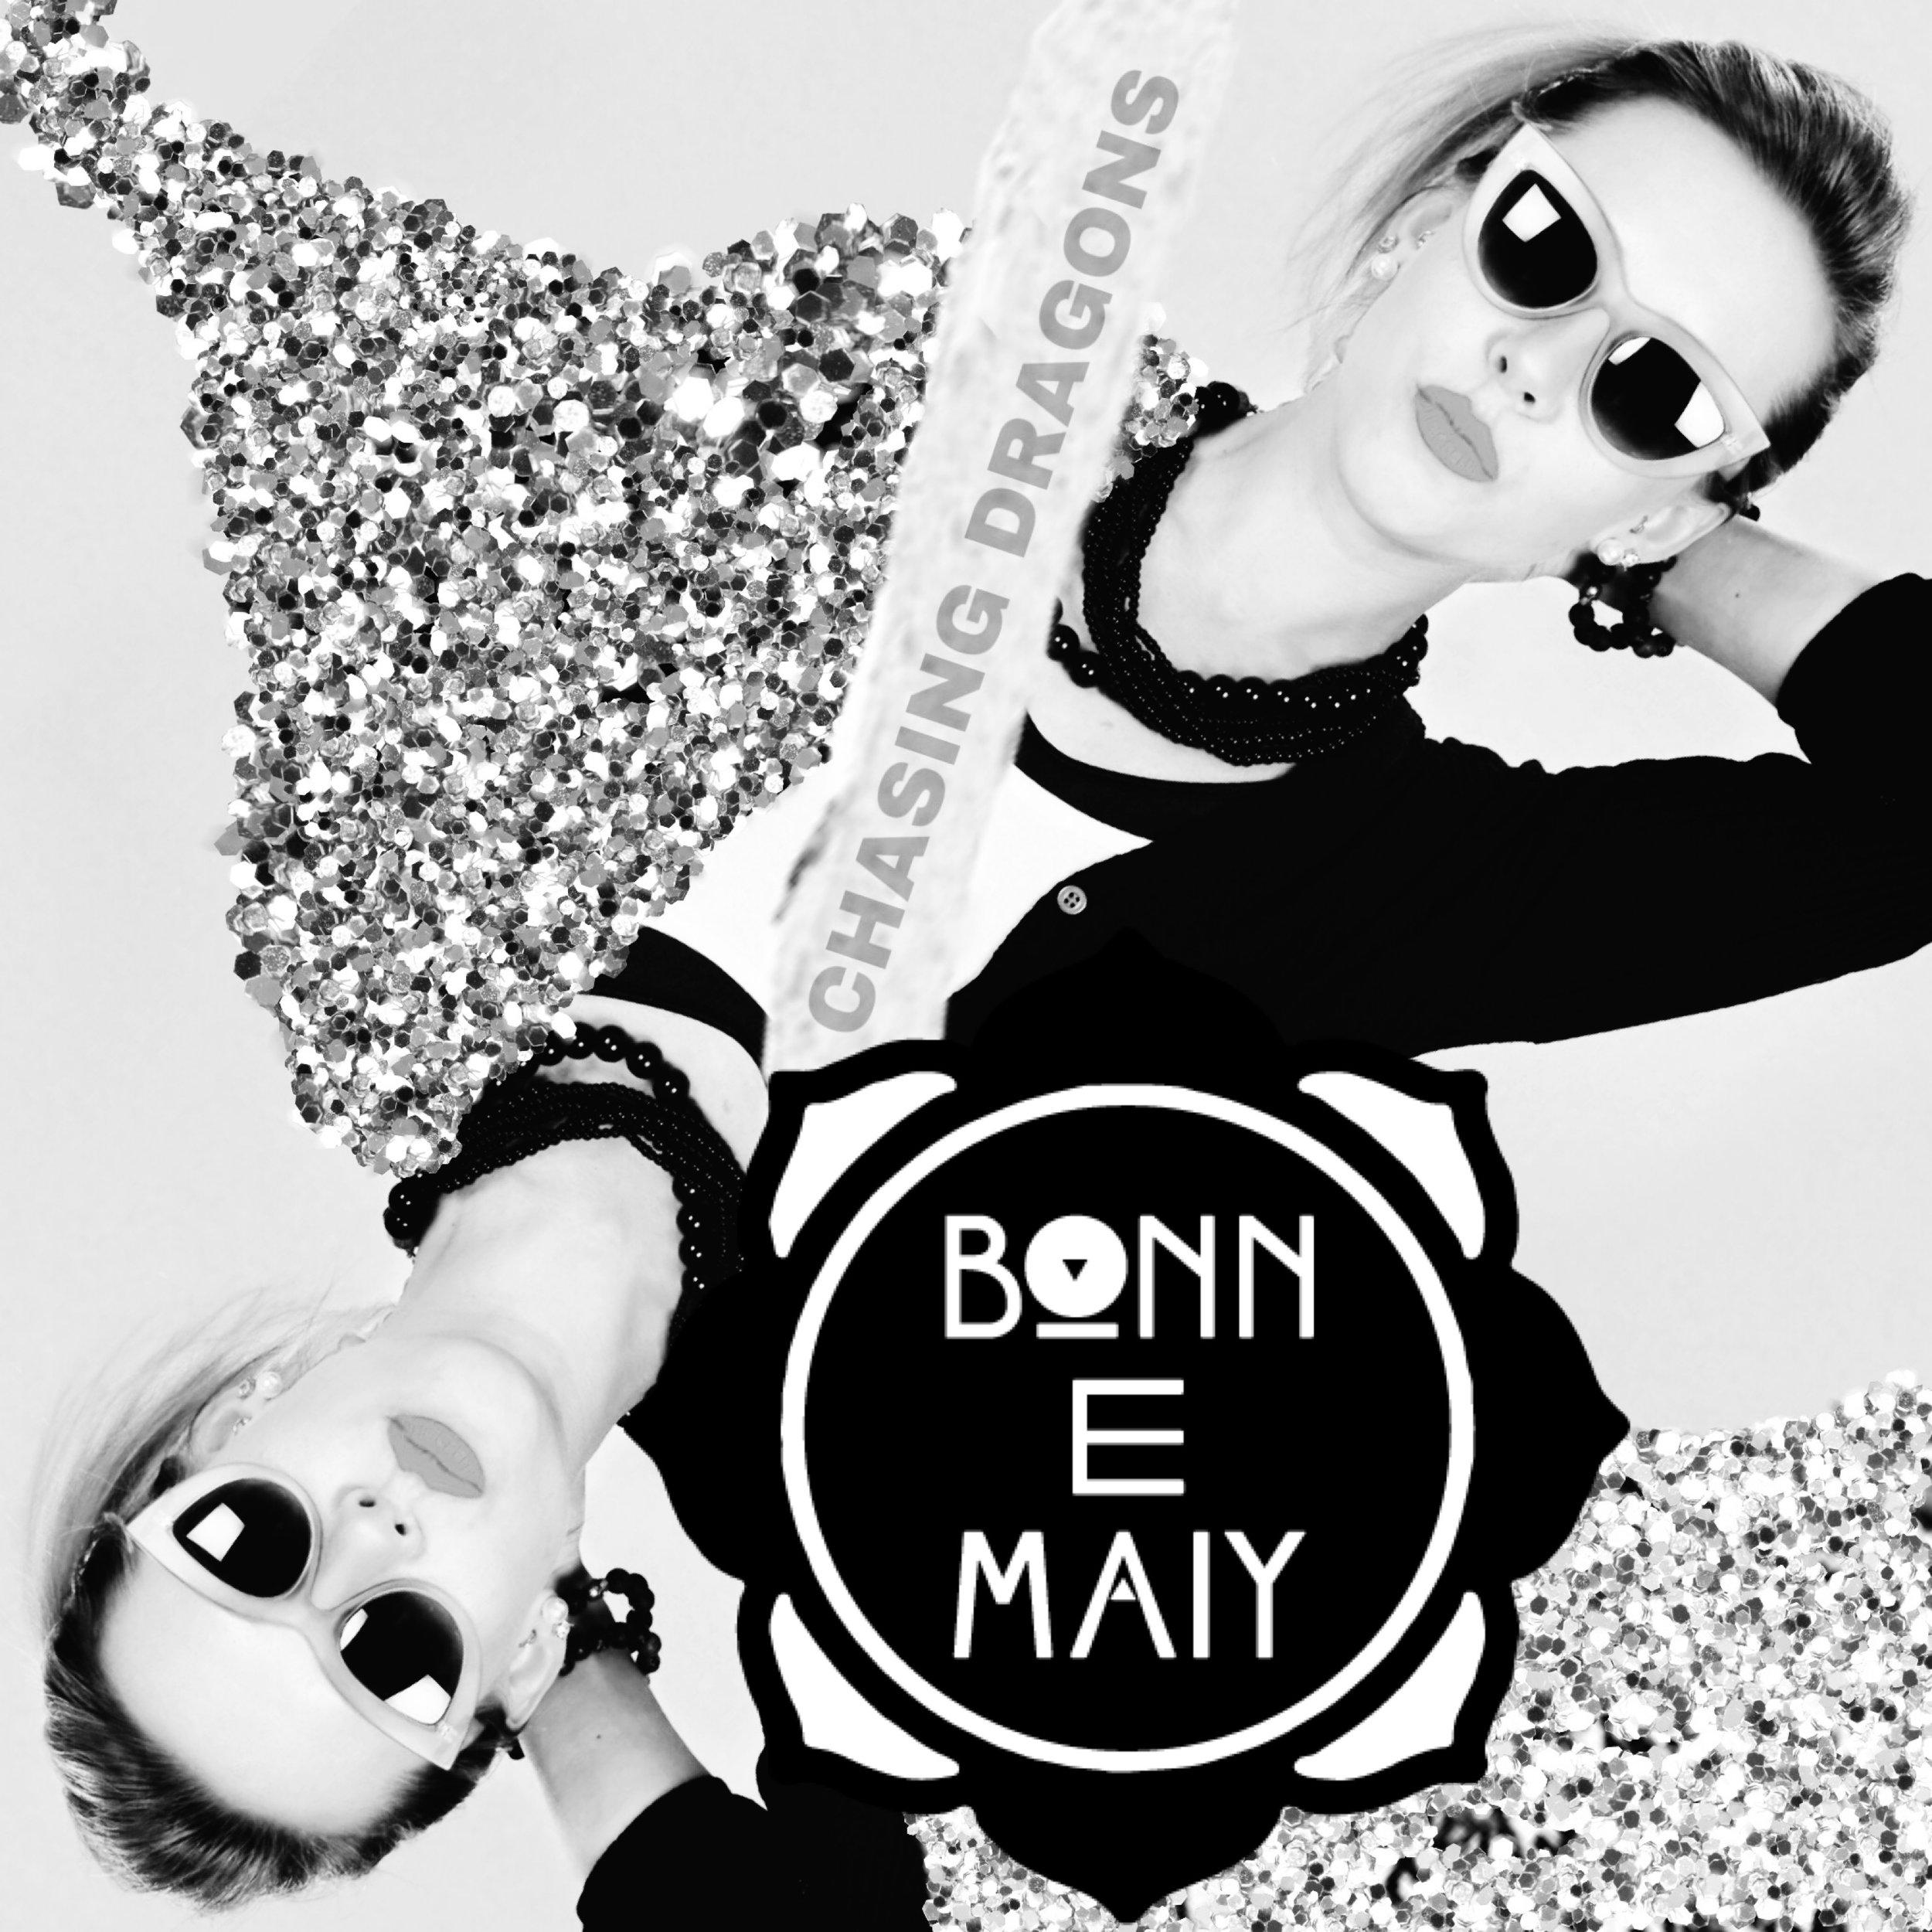 Bonn E Maiy - Chasing Dragons thumbnail.JPG